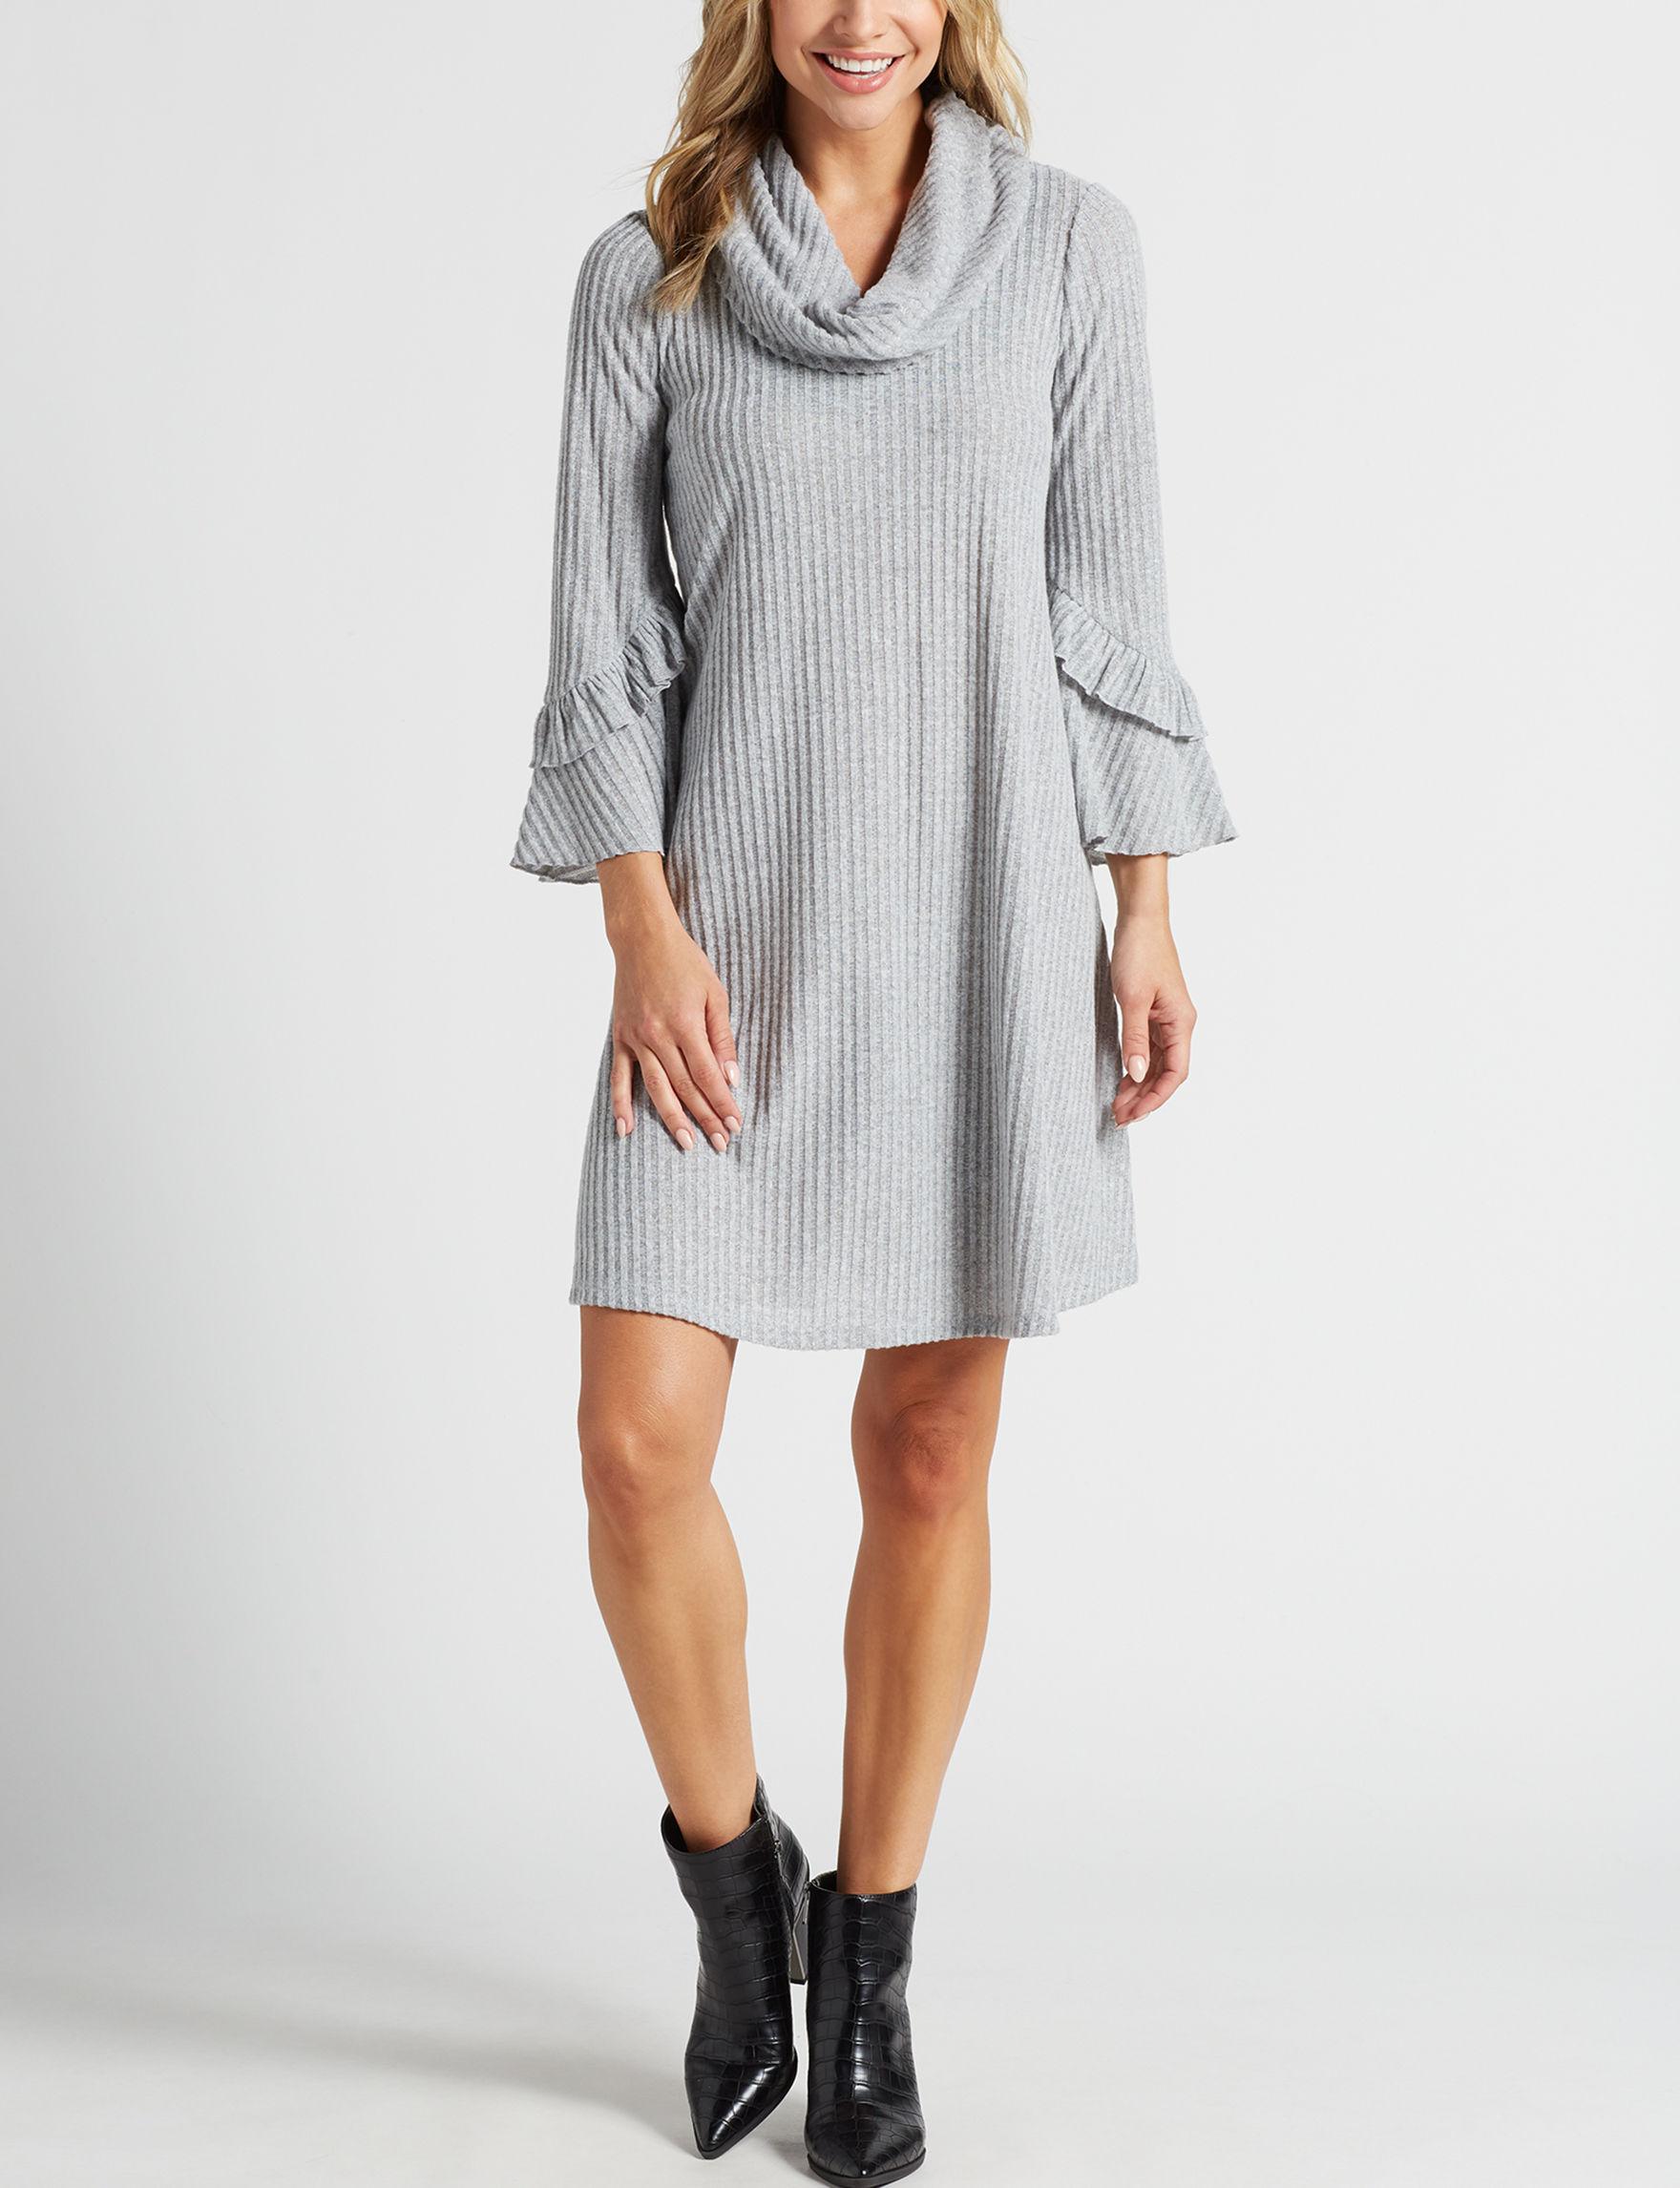 Robbie Bee Grey Everyday & Casual Sweater Dresses